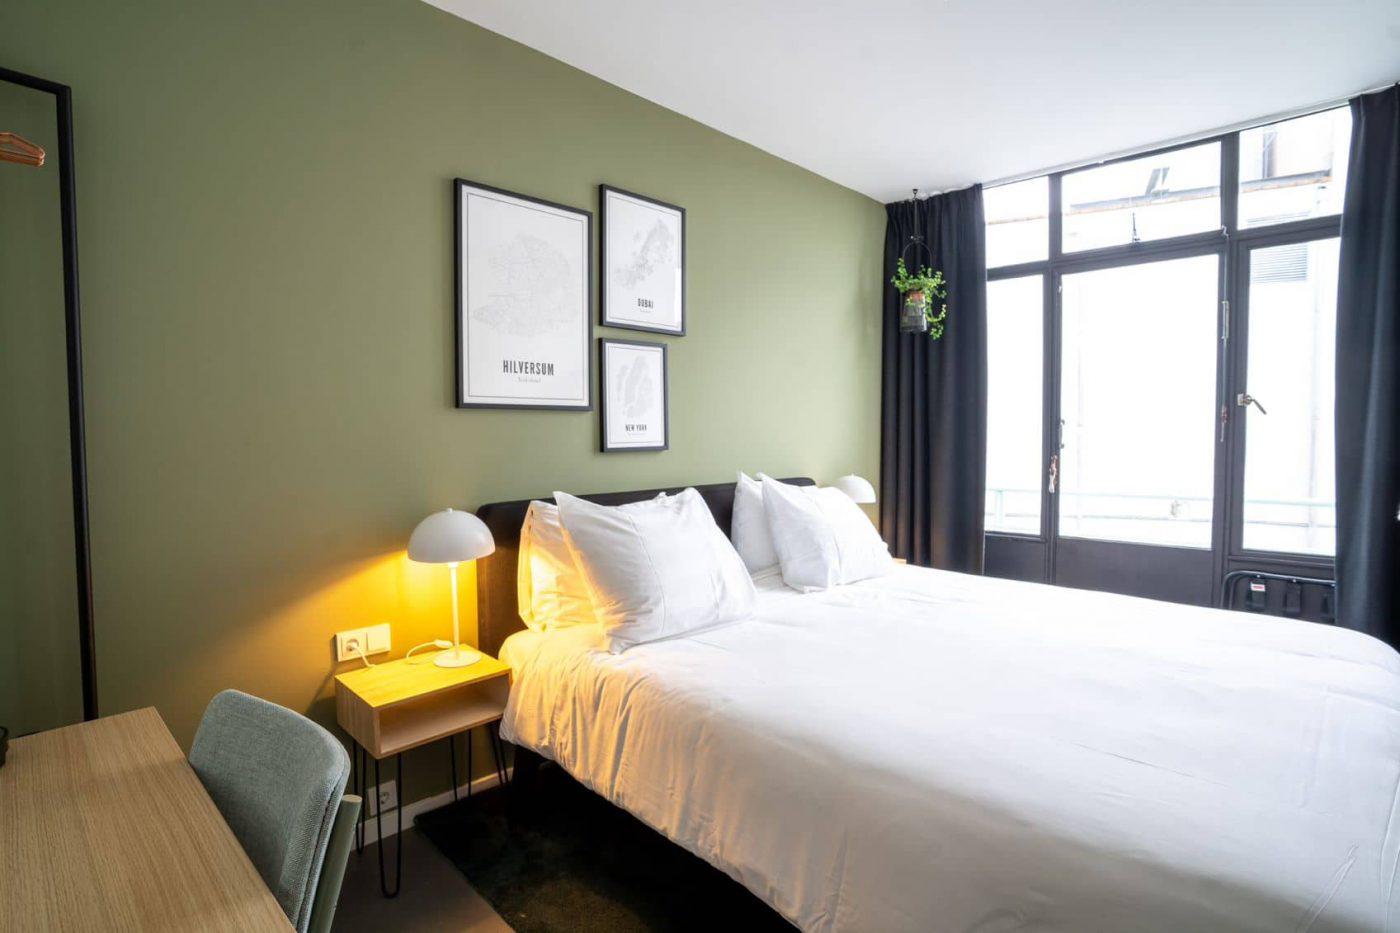 Superior/comfort kamer met groene wand